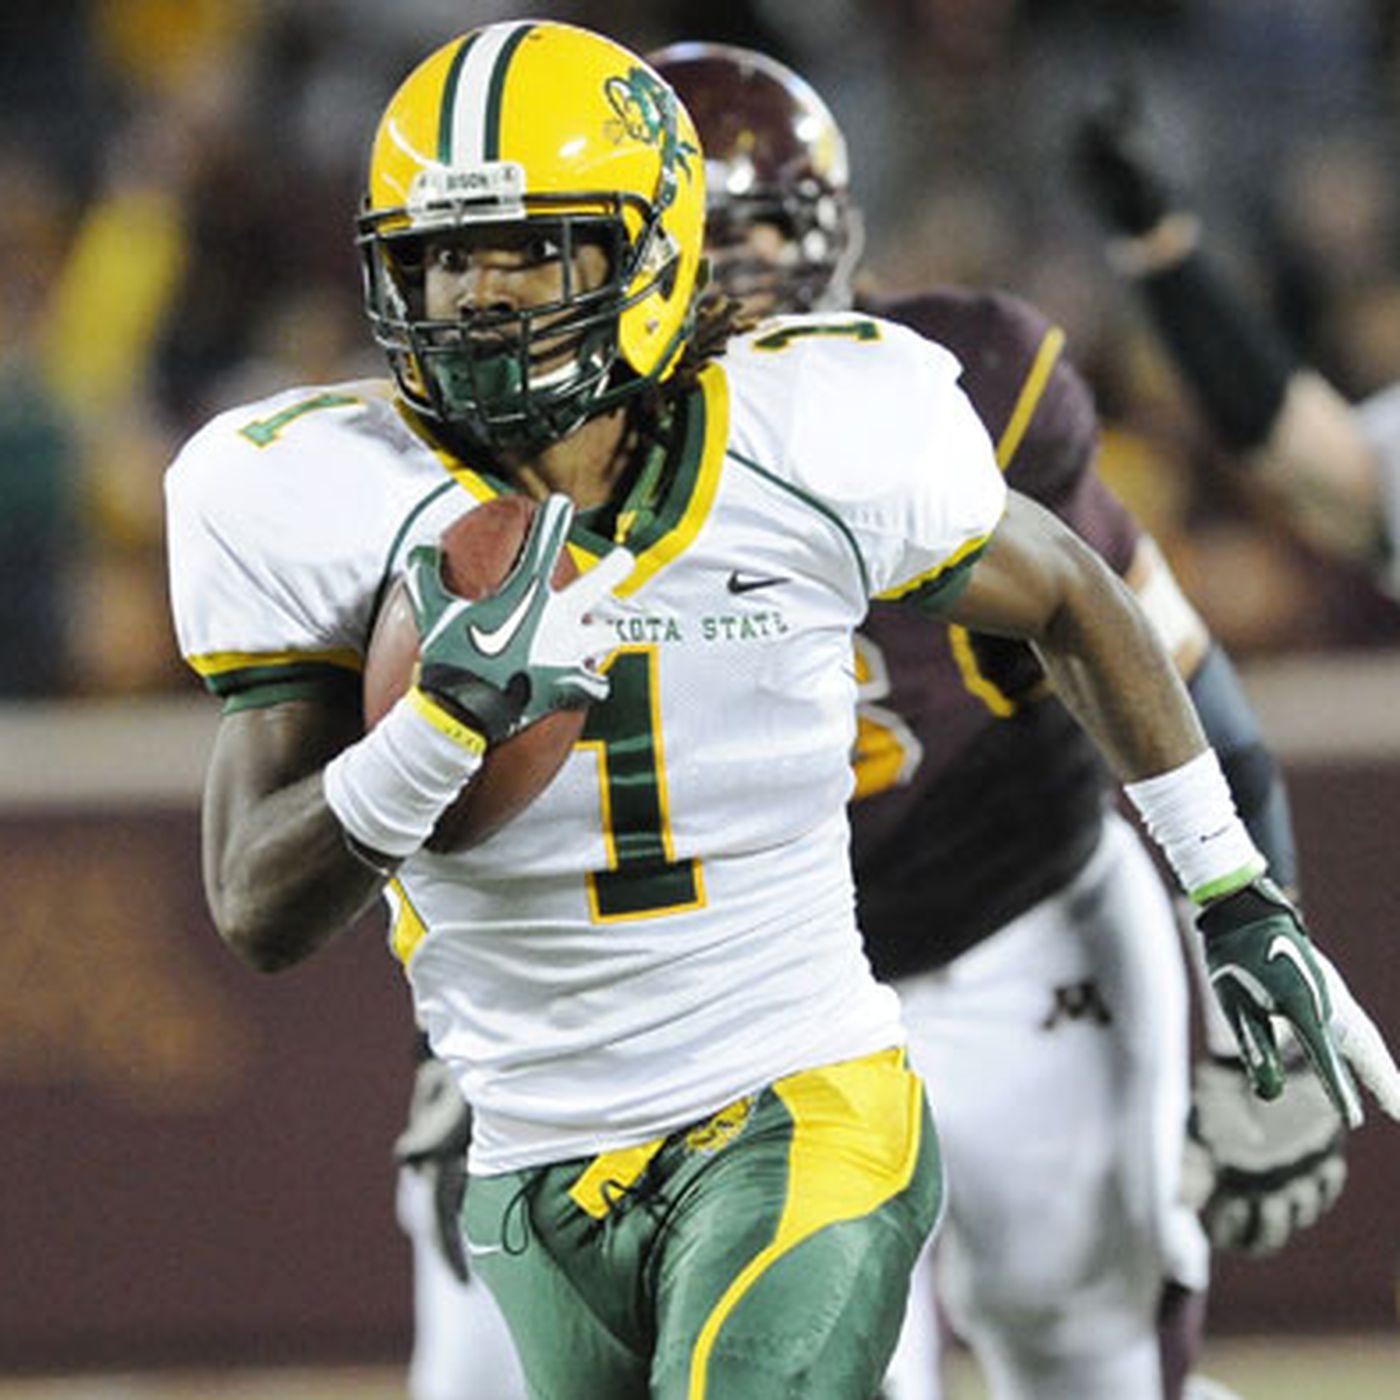 2c5f1e600 2014 NFL Draft Profile  North Dakota State cornerback Marcus Williams